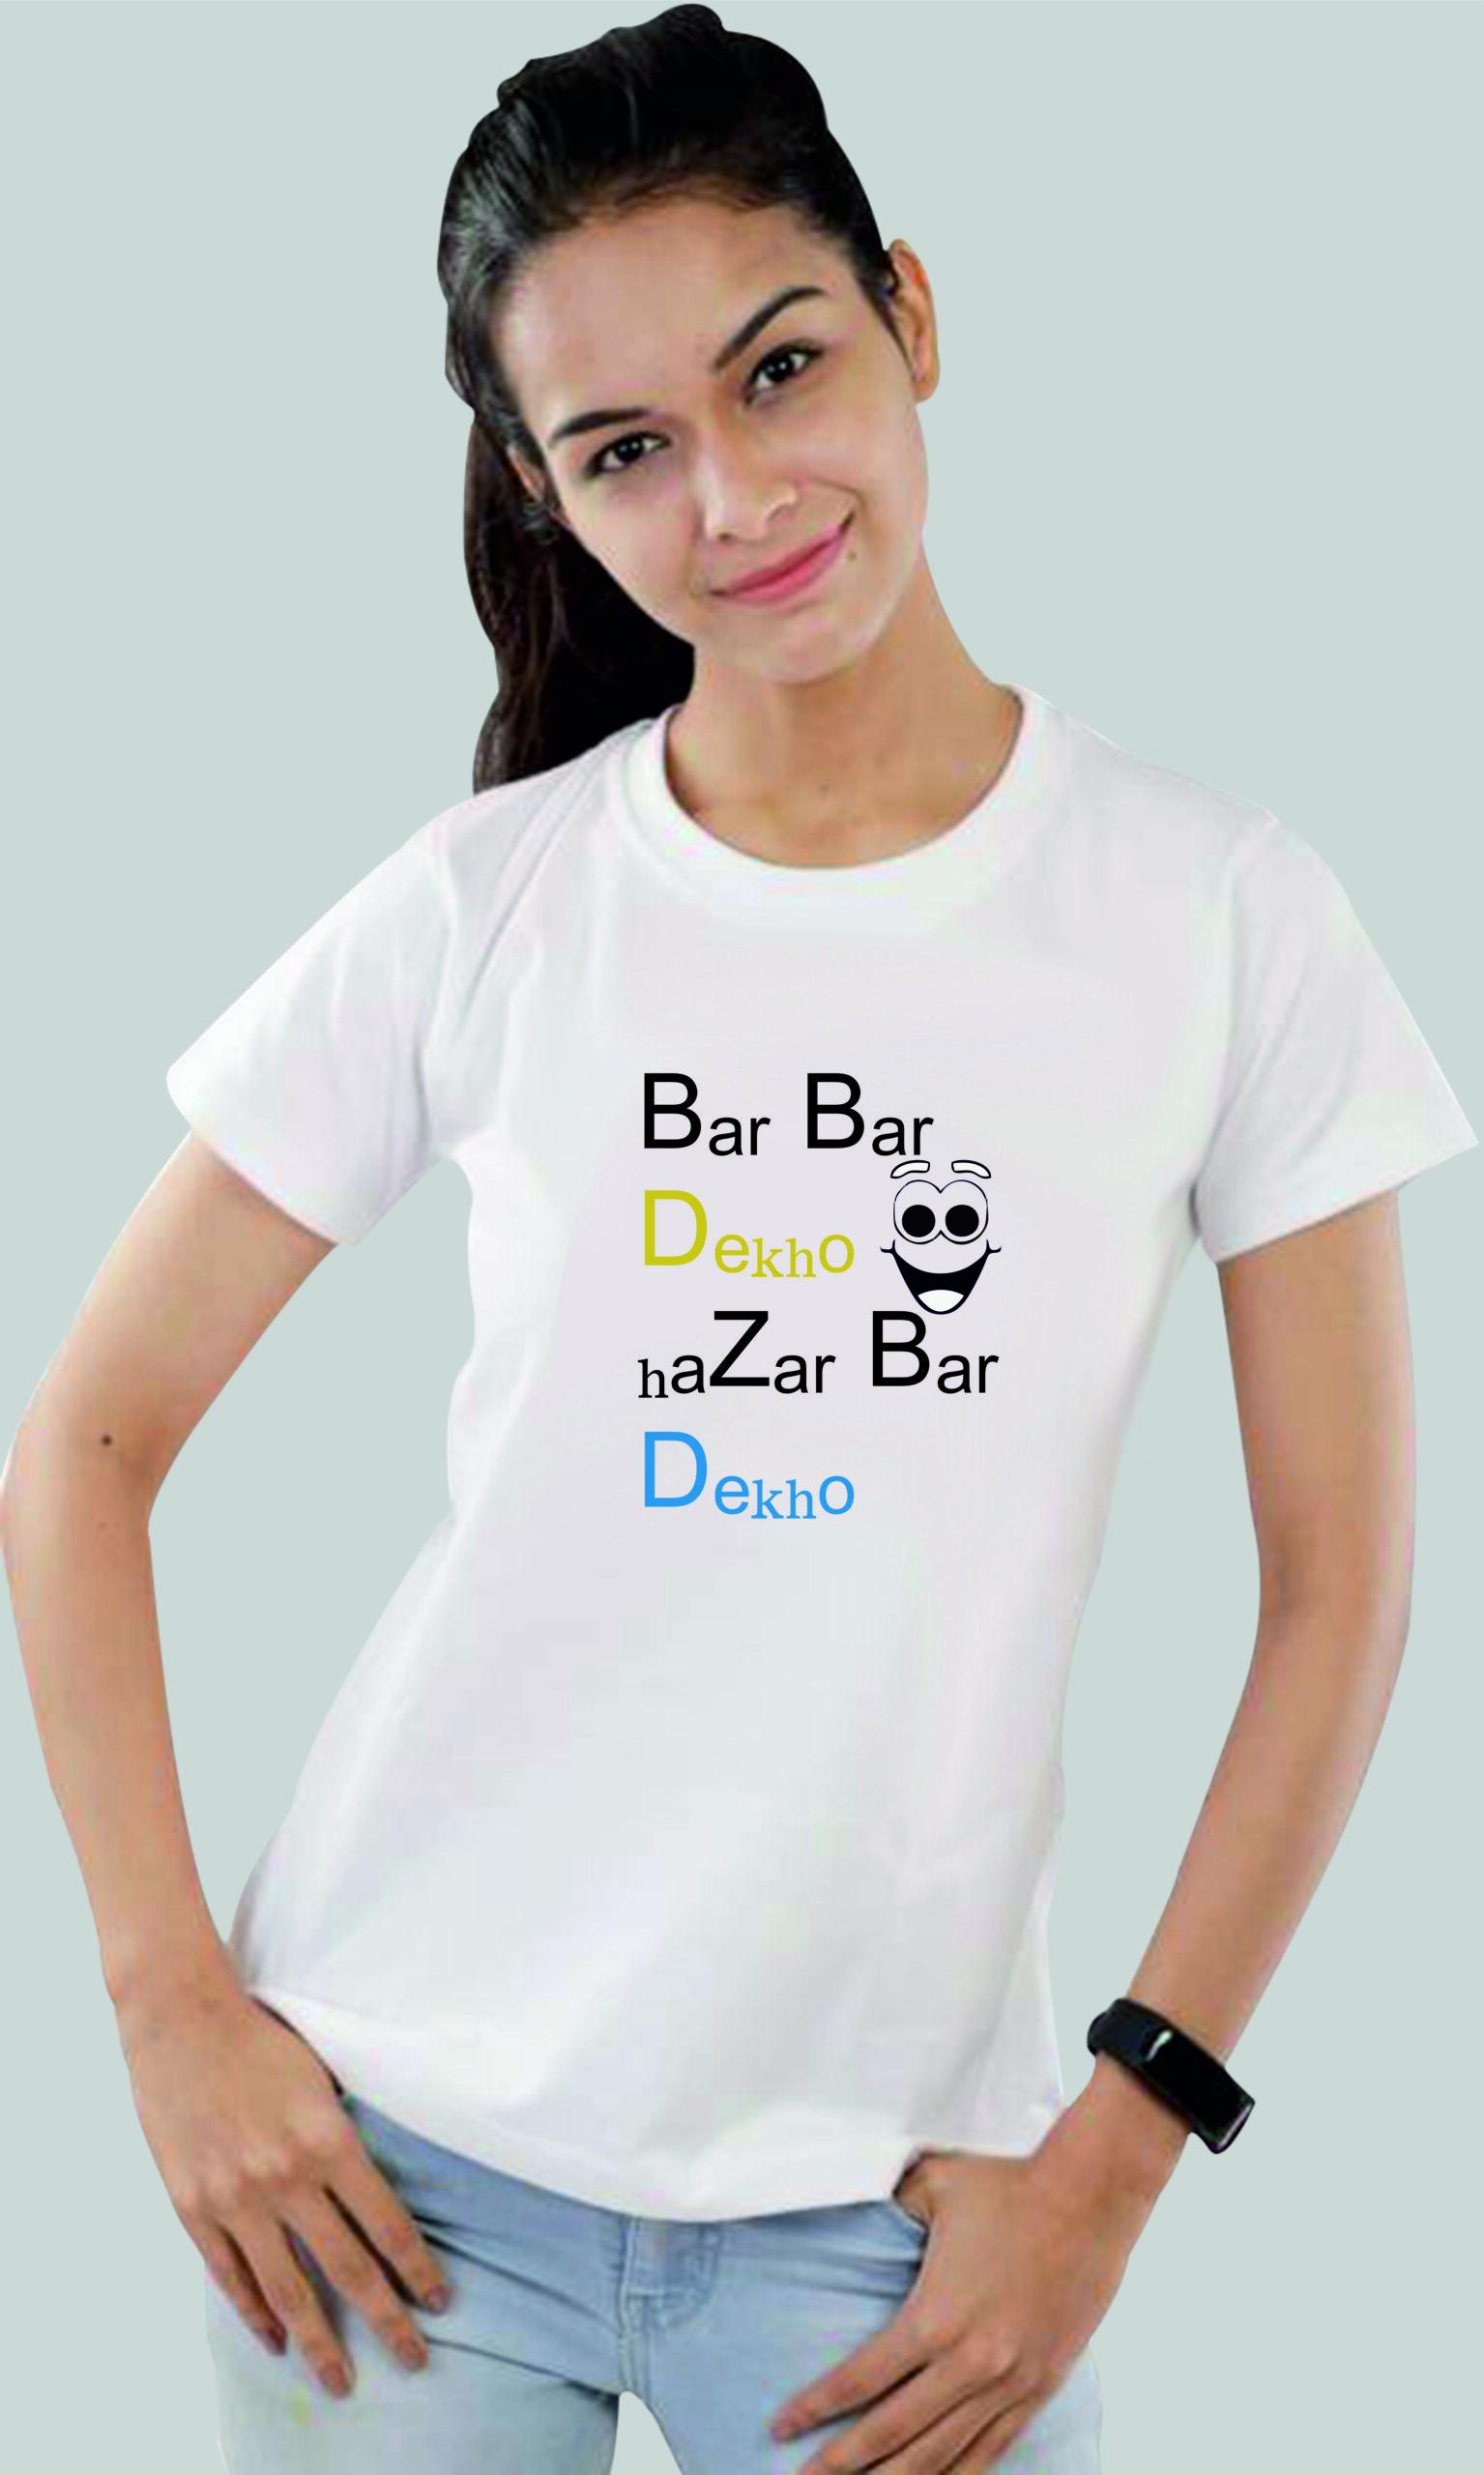 Bar Baar Dekho 2 scaled – Crazy Sutra